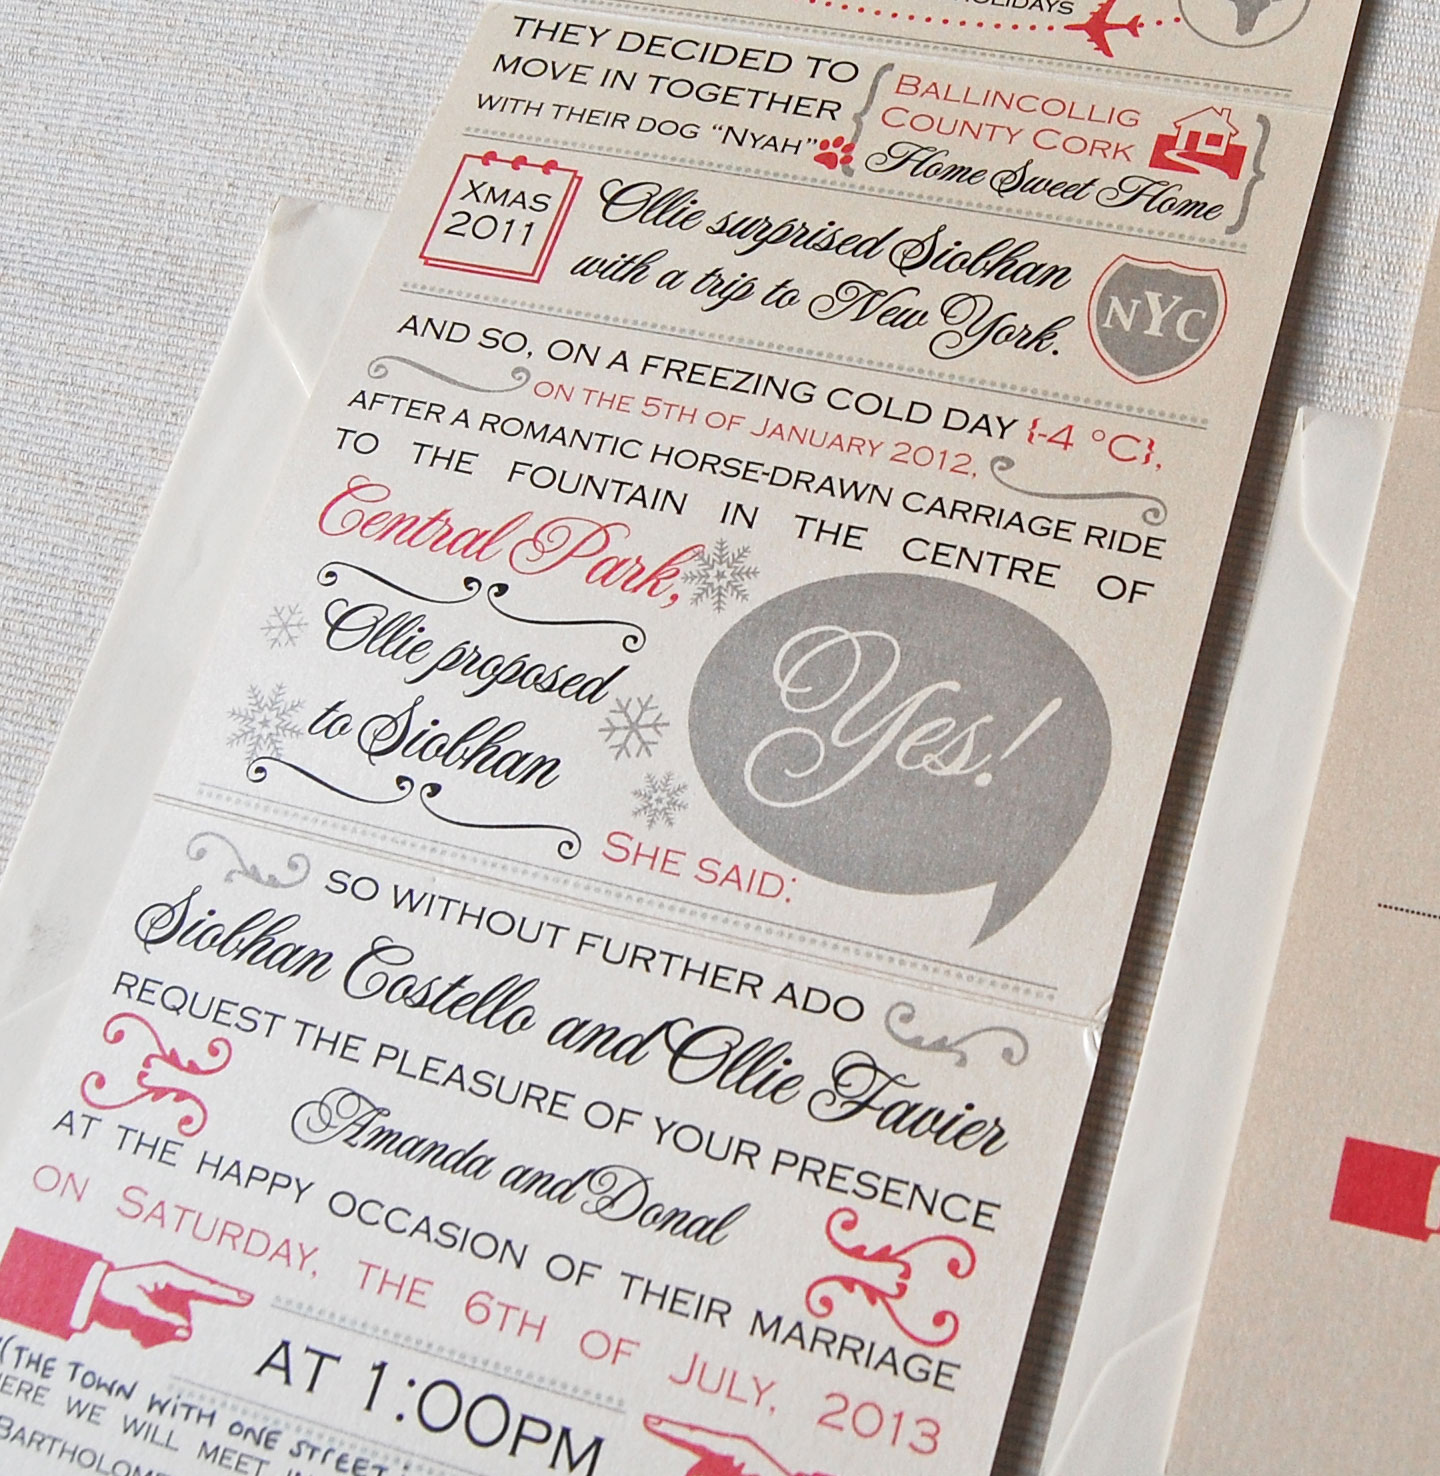 wedding invitation wording wedding invitation wording With wedding invitation wording love story